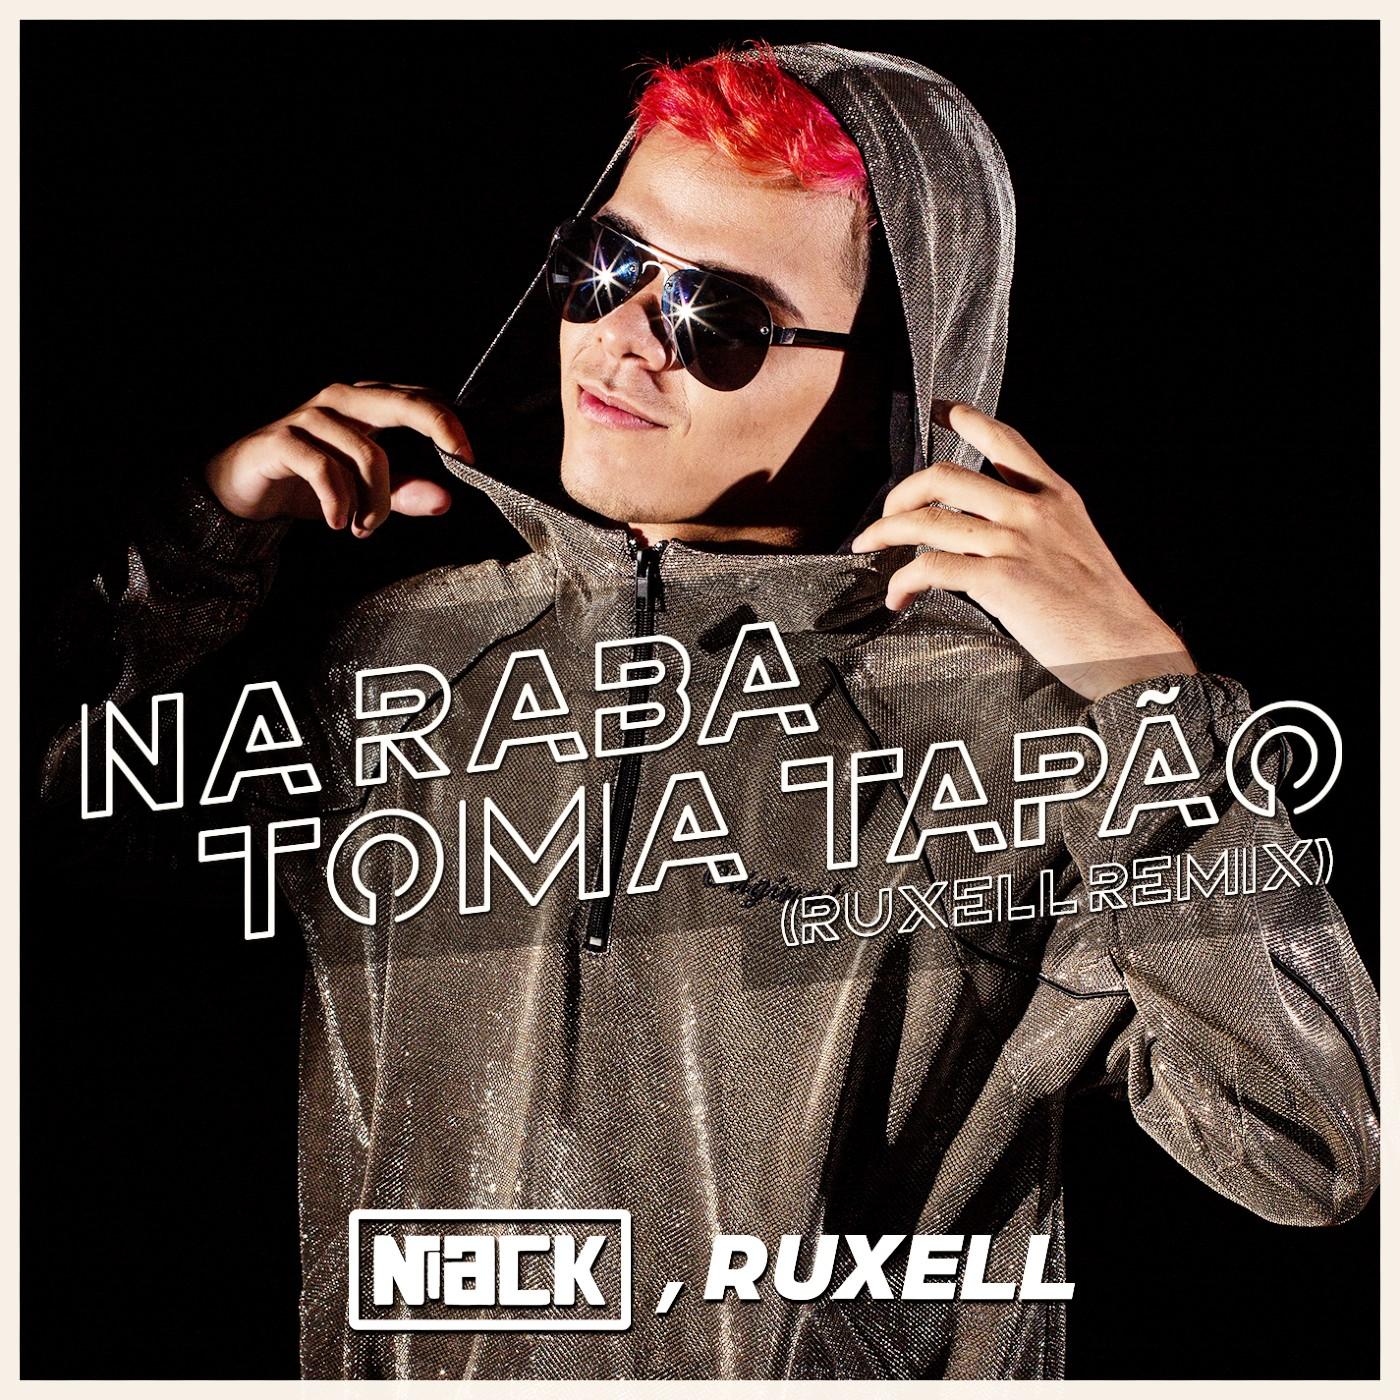 MC Niack estreia remixes inéditos